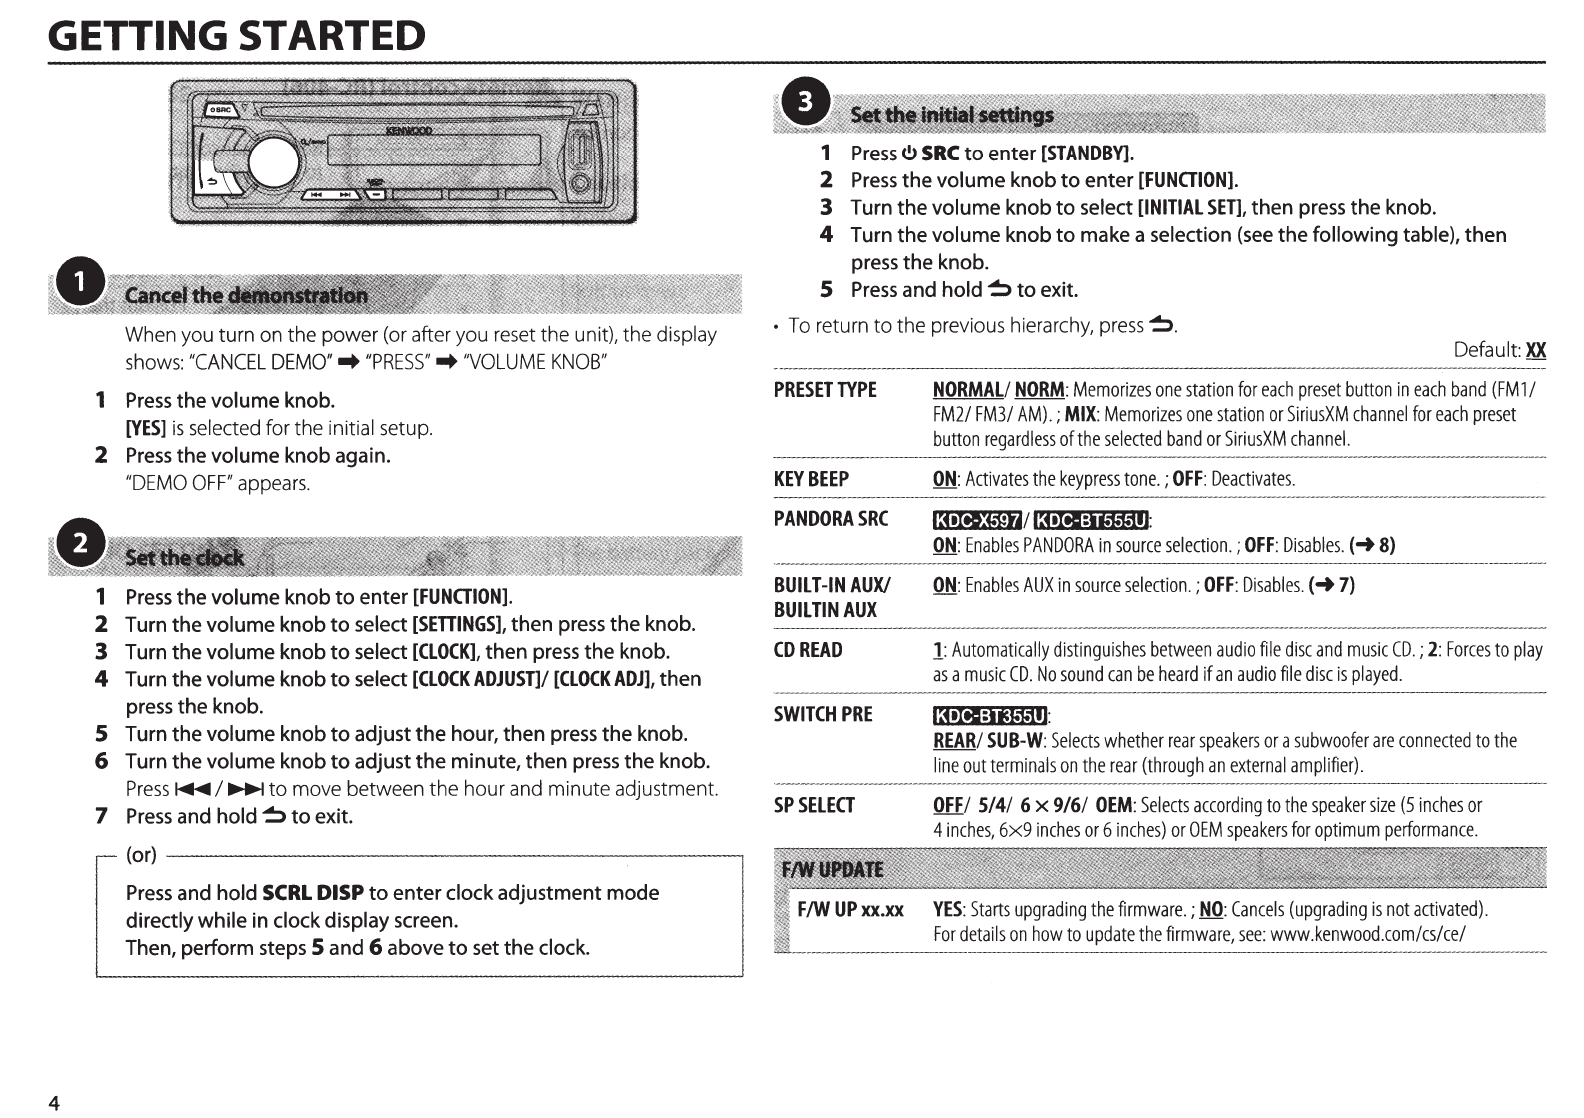 Wiring Diagram Kenwood Excelon Kdc X597